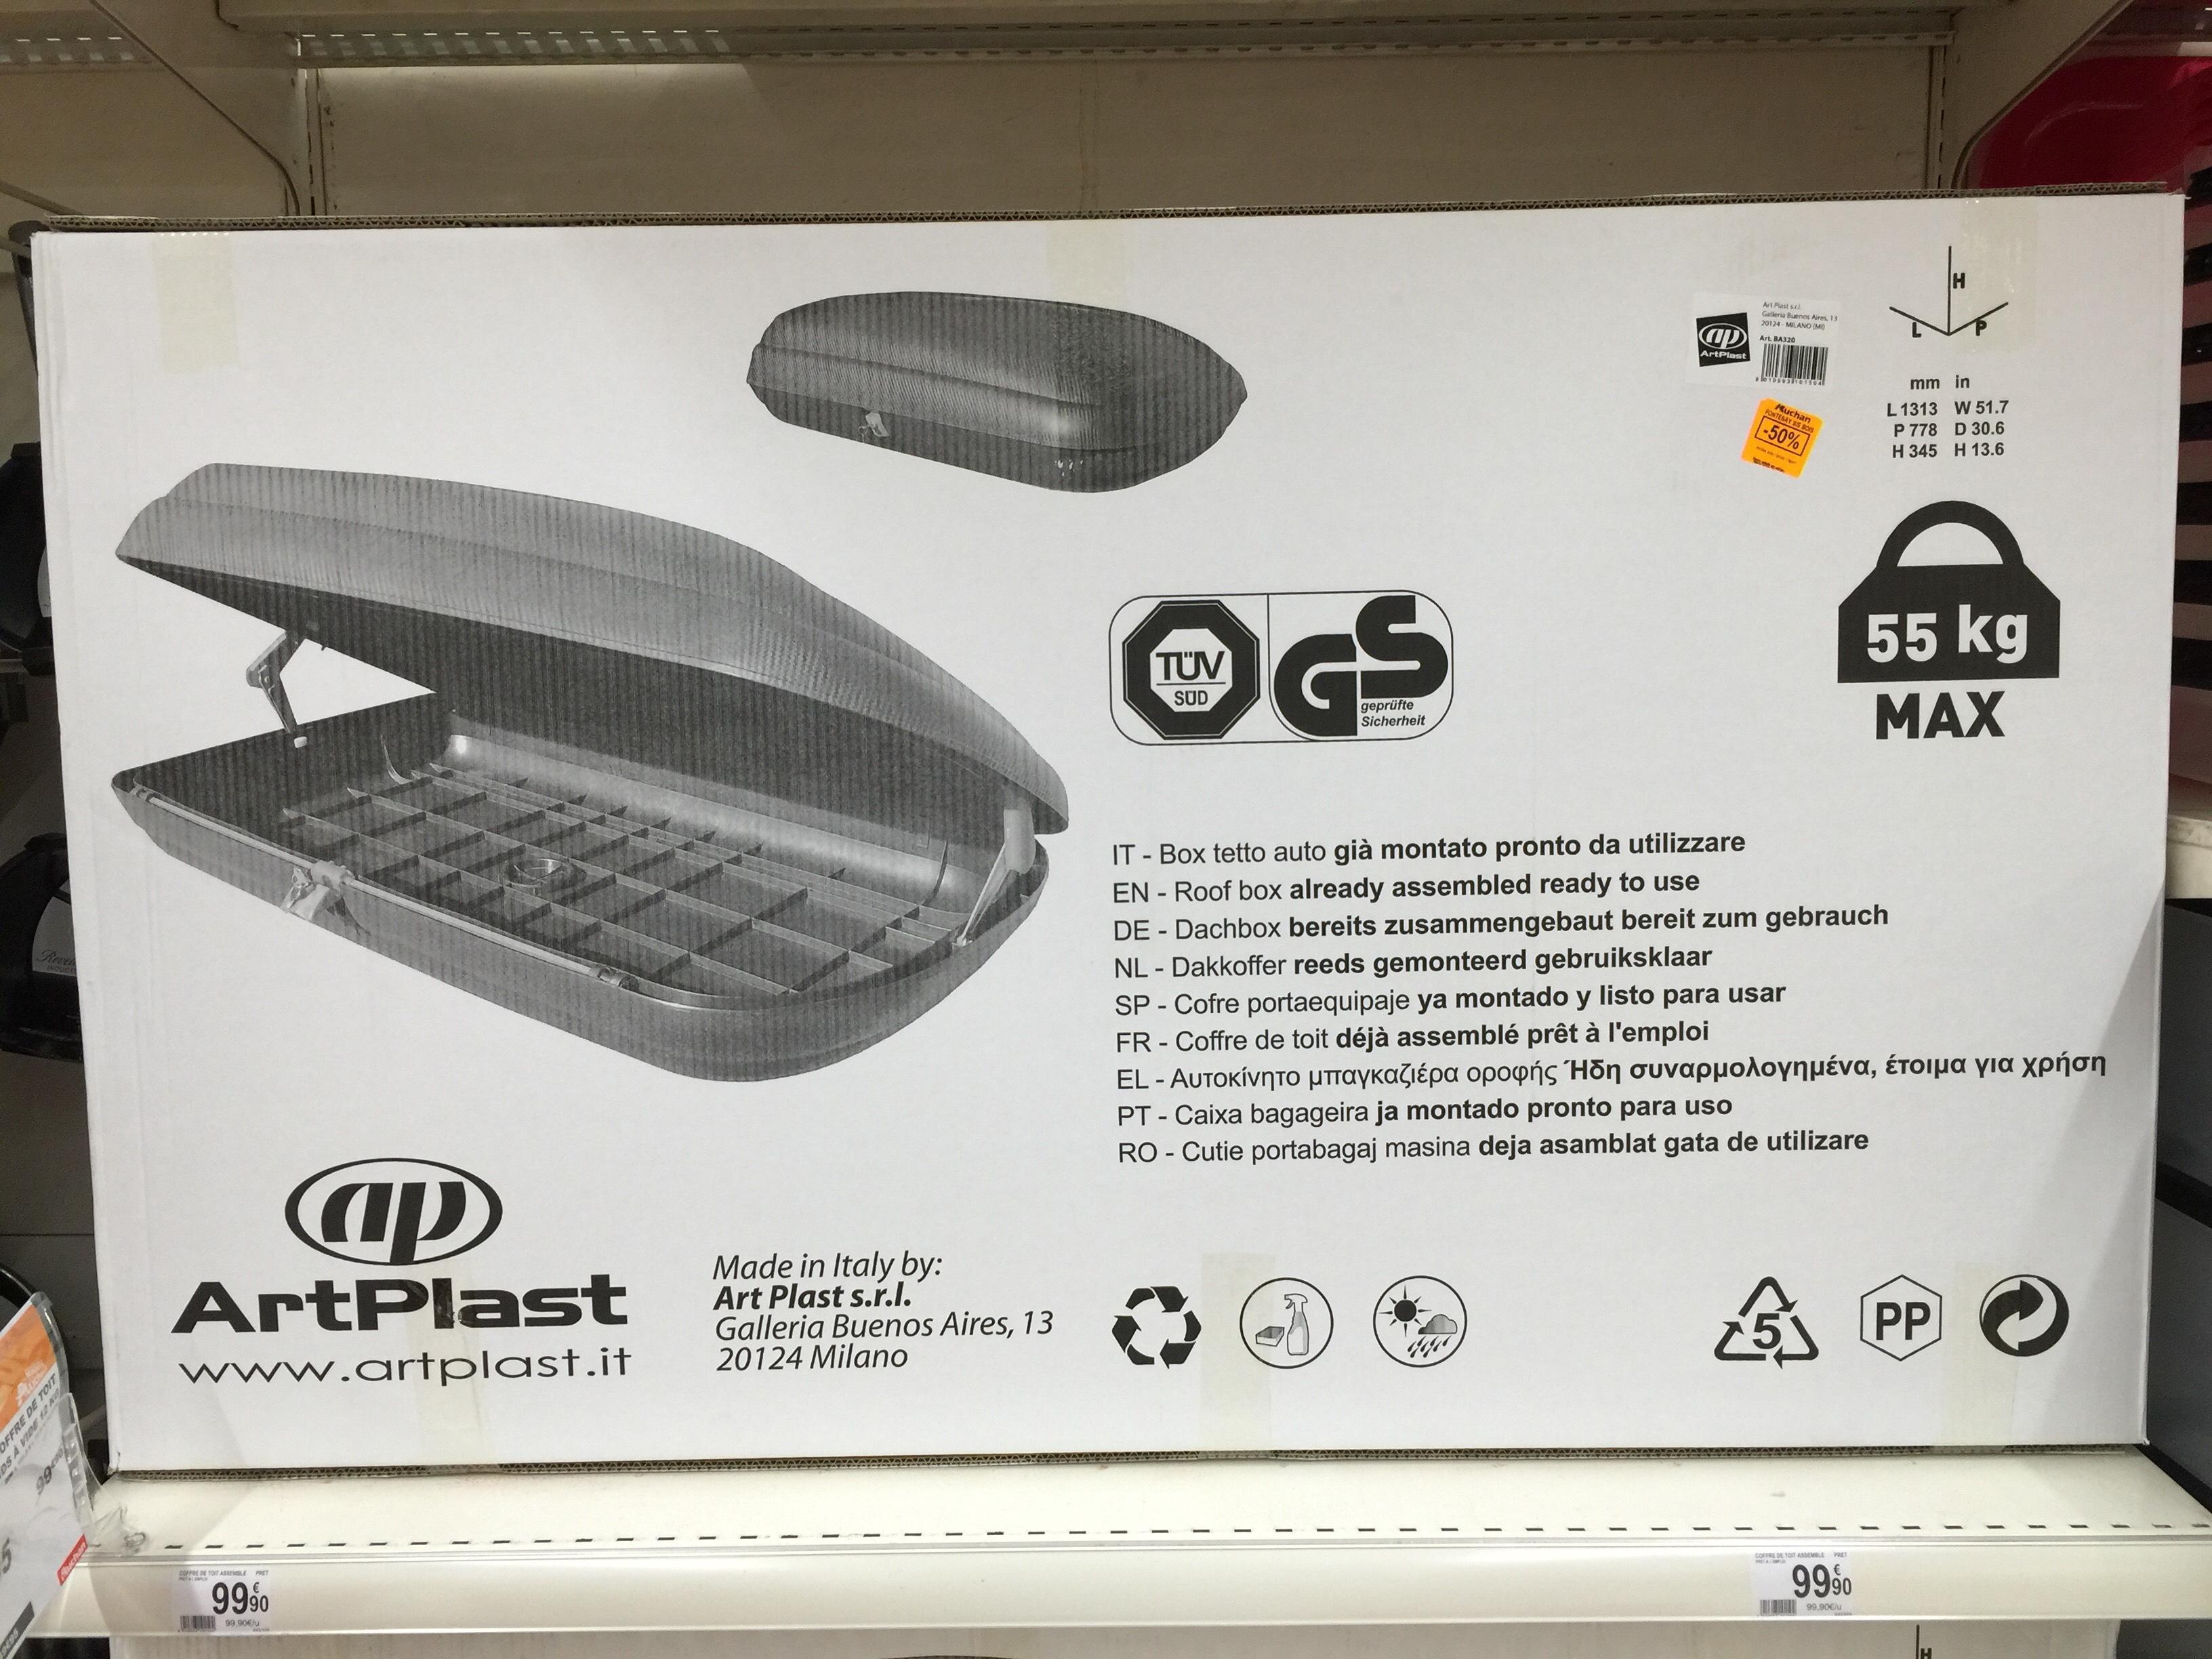 Coffre de toit ArtPlast BA320 (Max 55 kg)